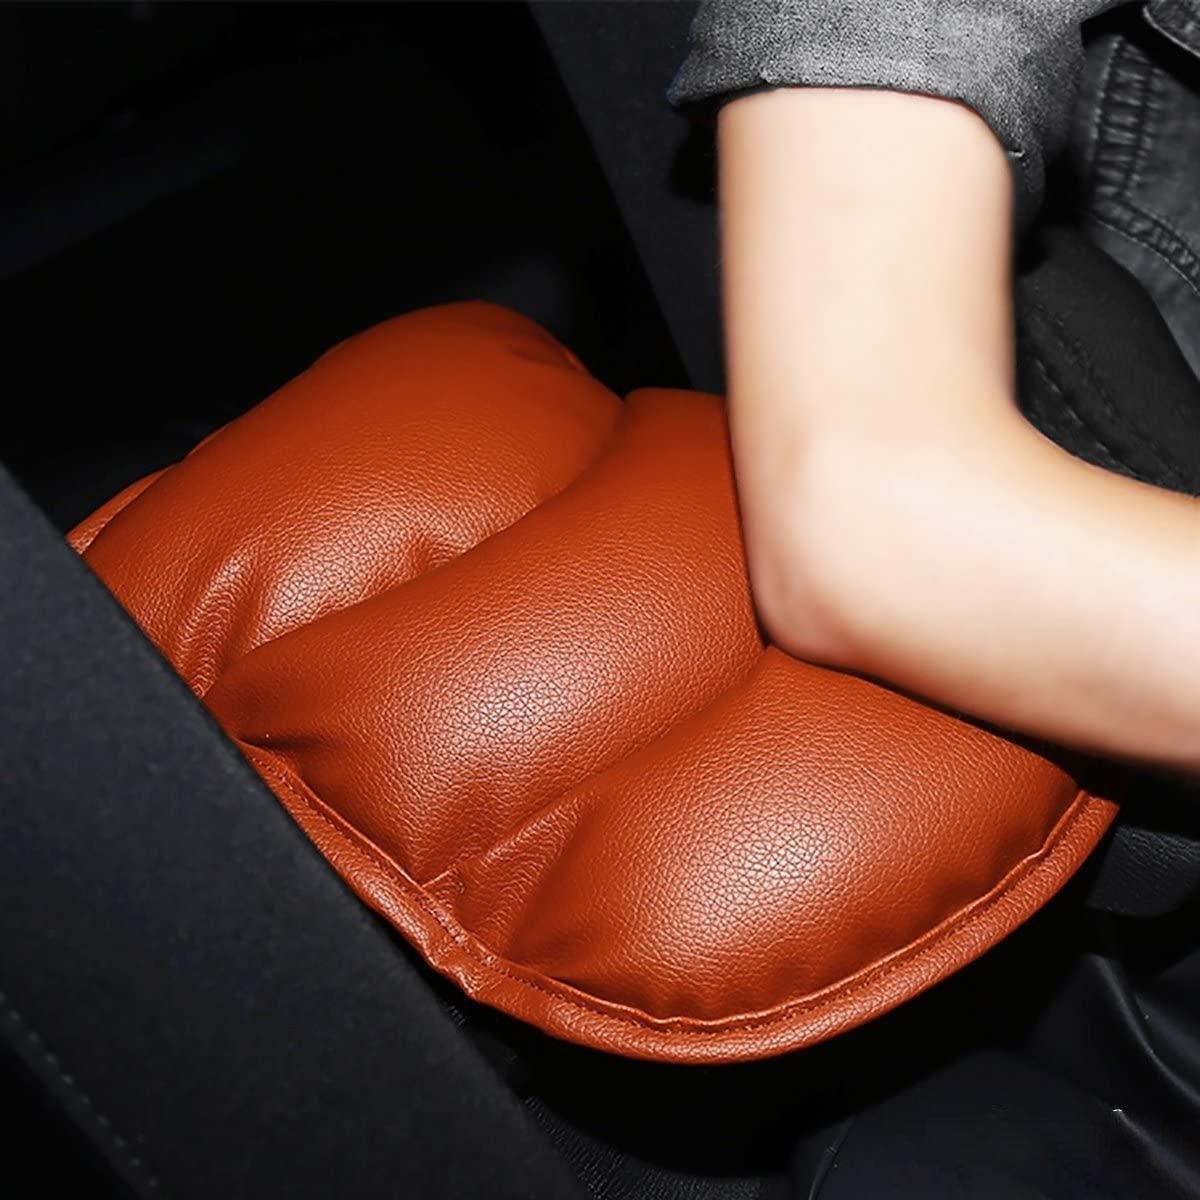 PU Soft Leather Car Center Console Cover Kissen (11x 8,6 Zoll) Armlehne Pad für Auto Motor Auto Fahrzeug GPS